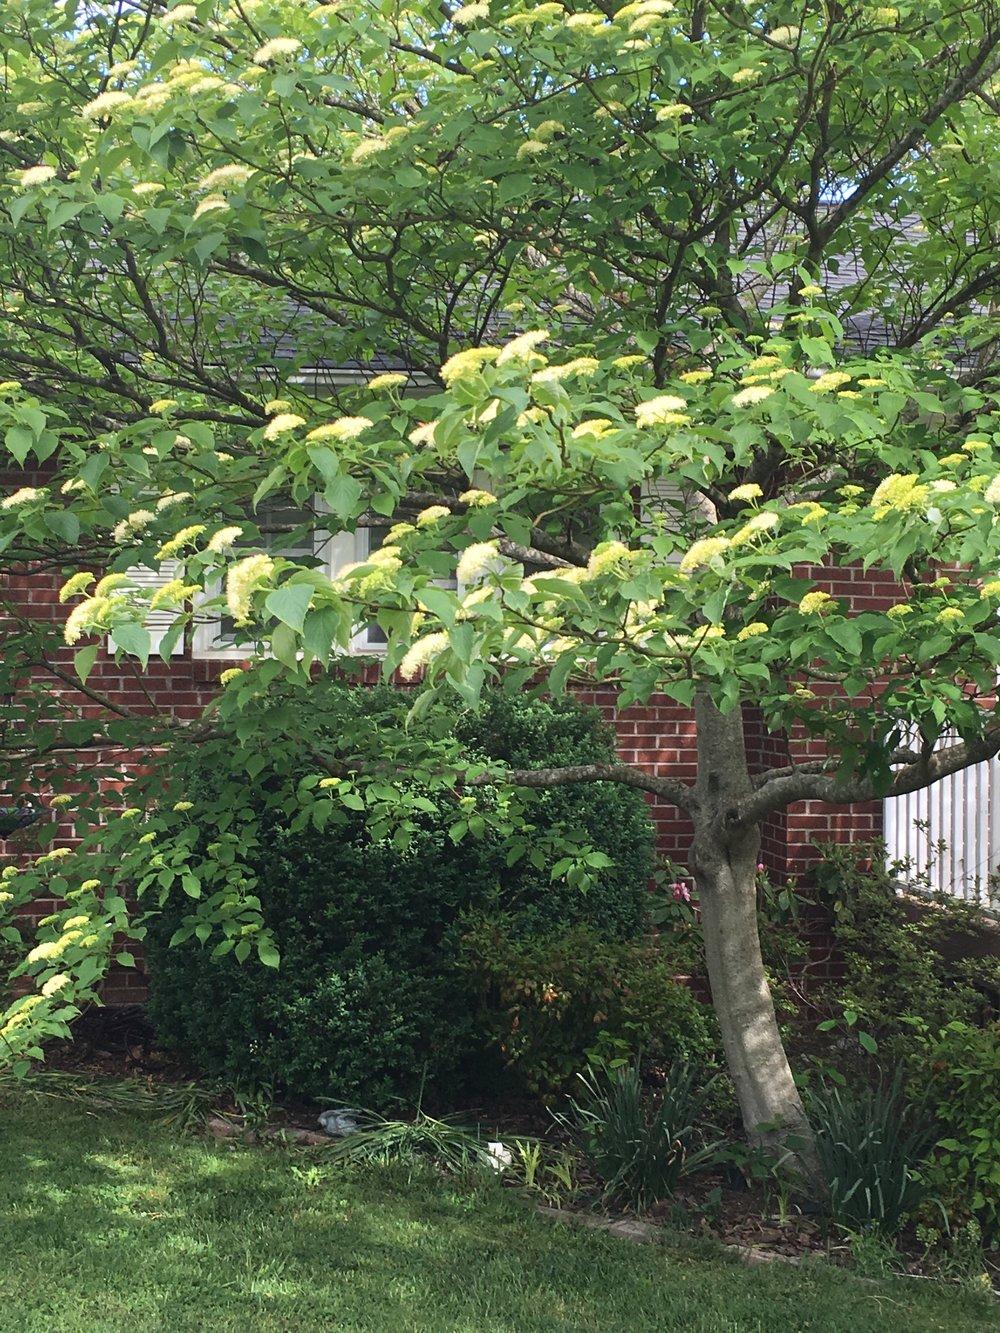 Cornus drummondii; Rough leaf dogwood